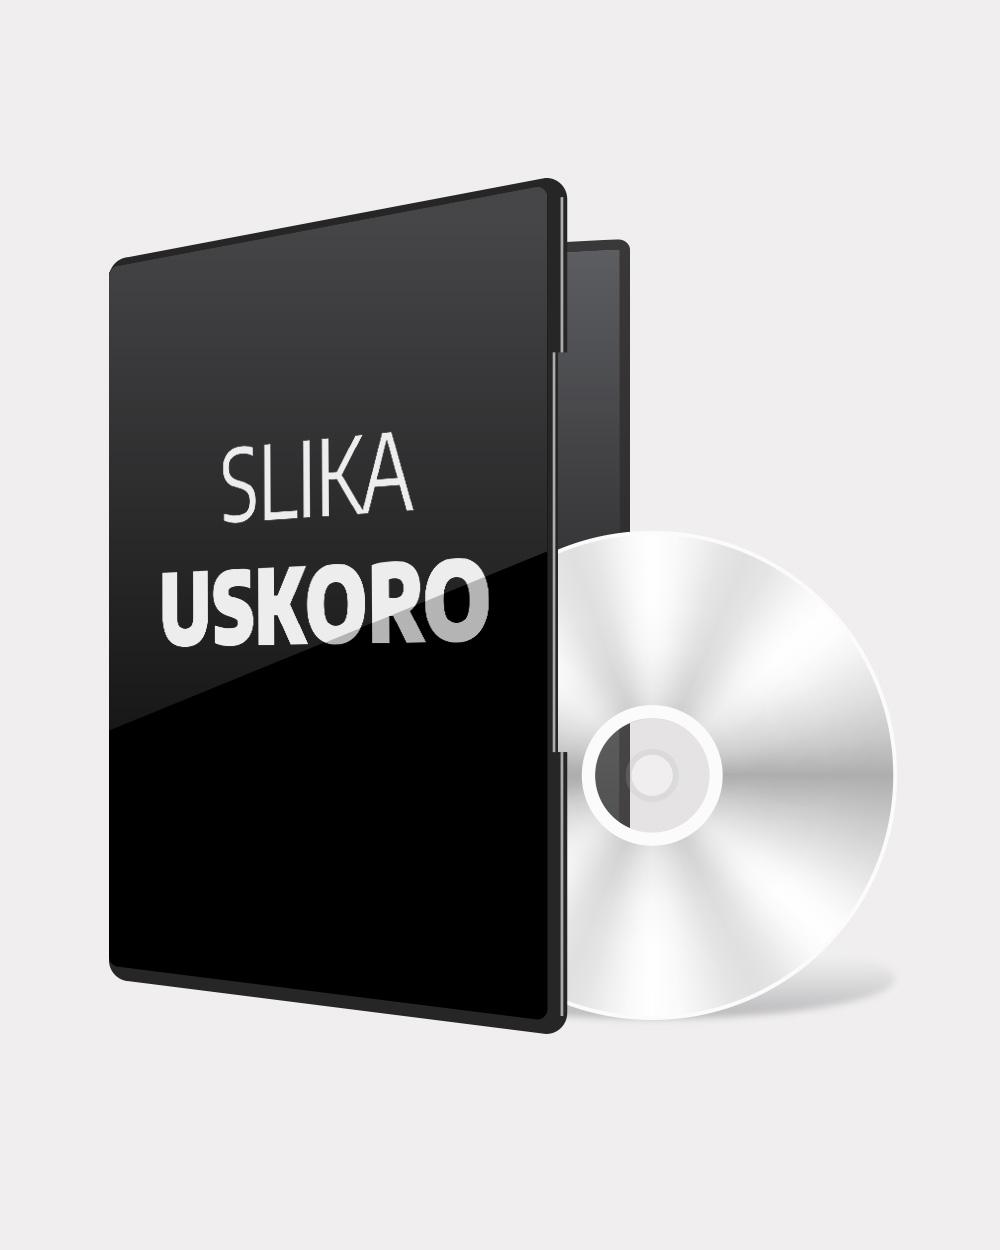 PS4 Far Cry 3 HD